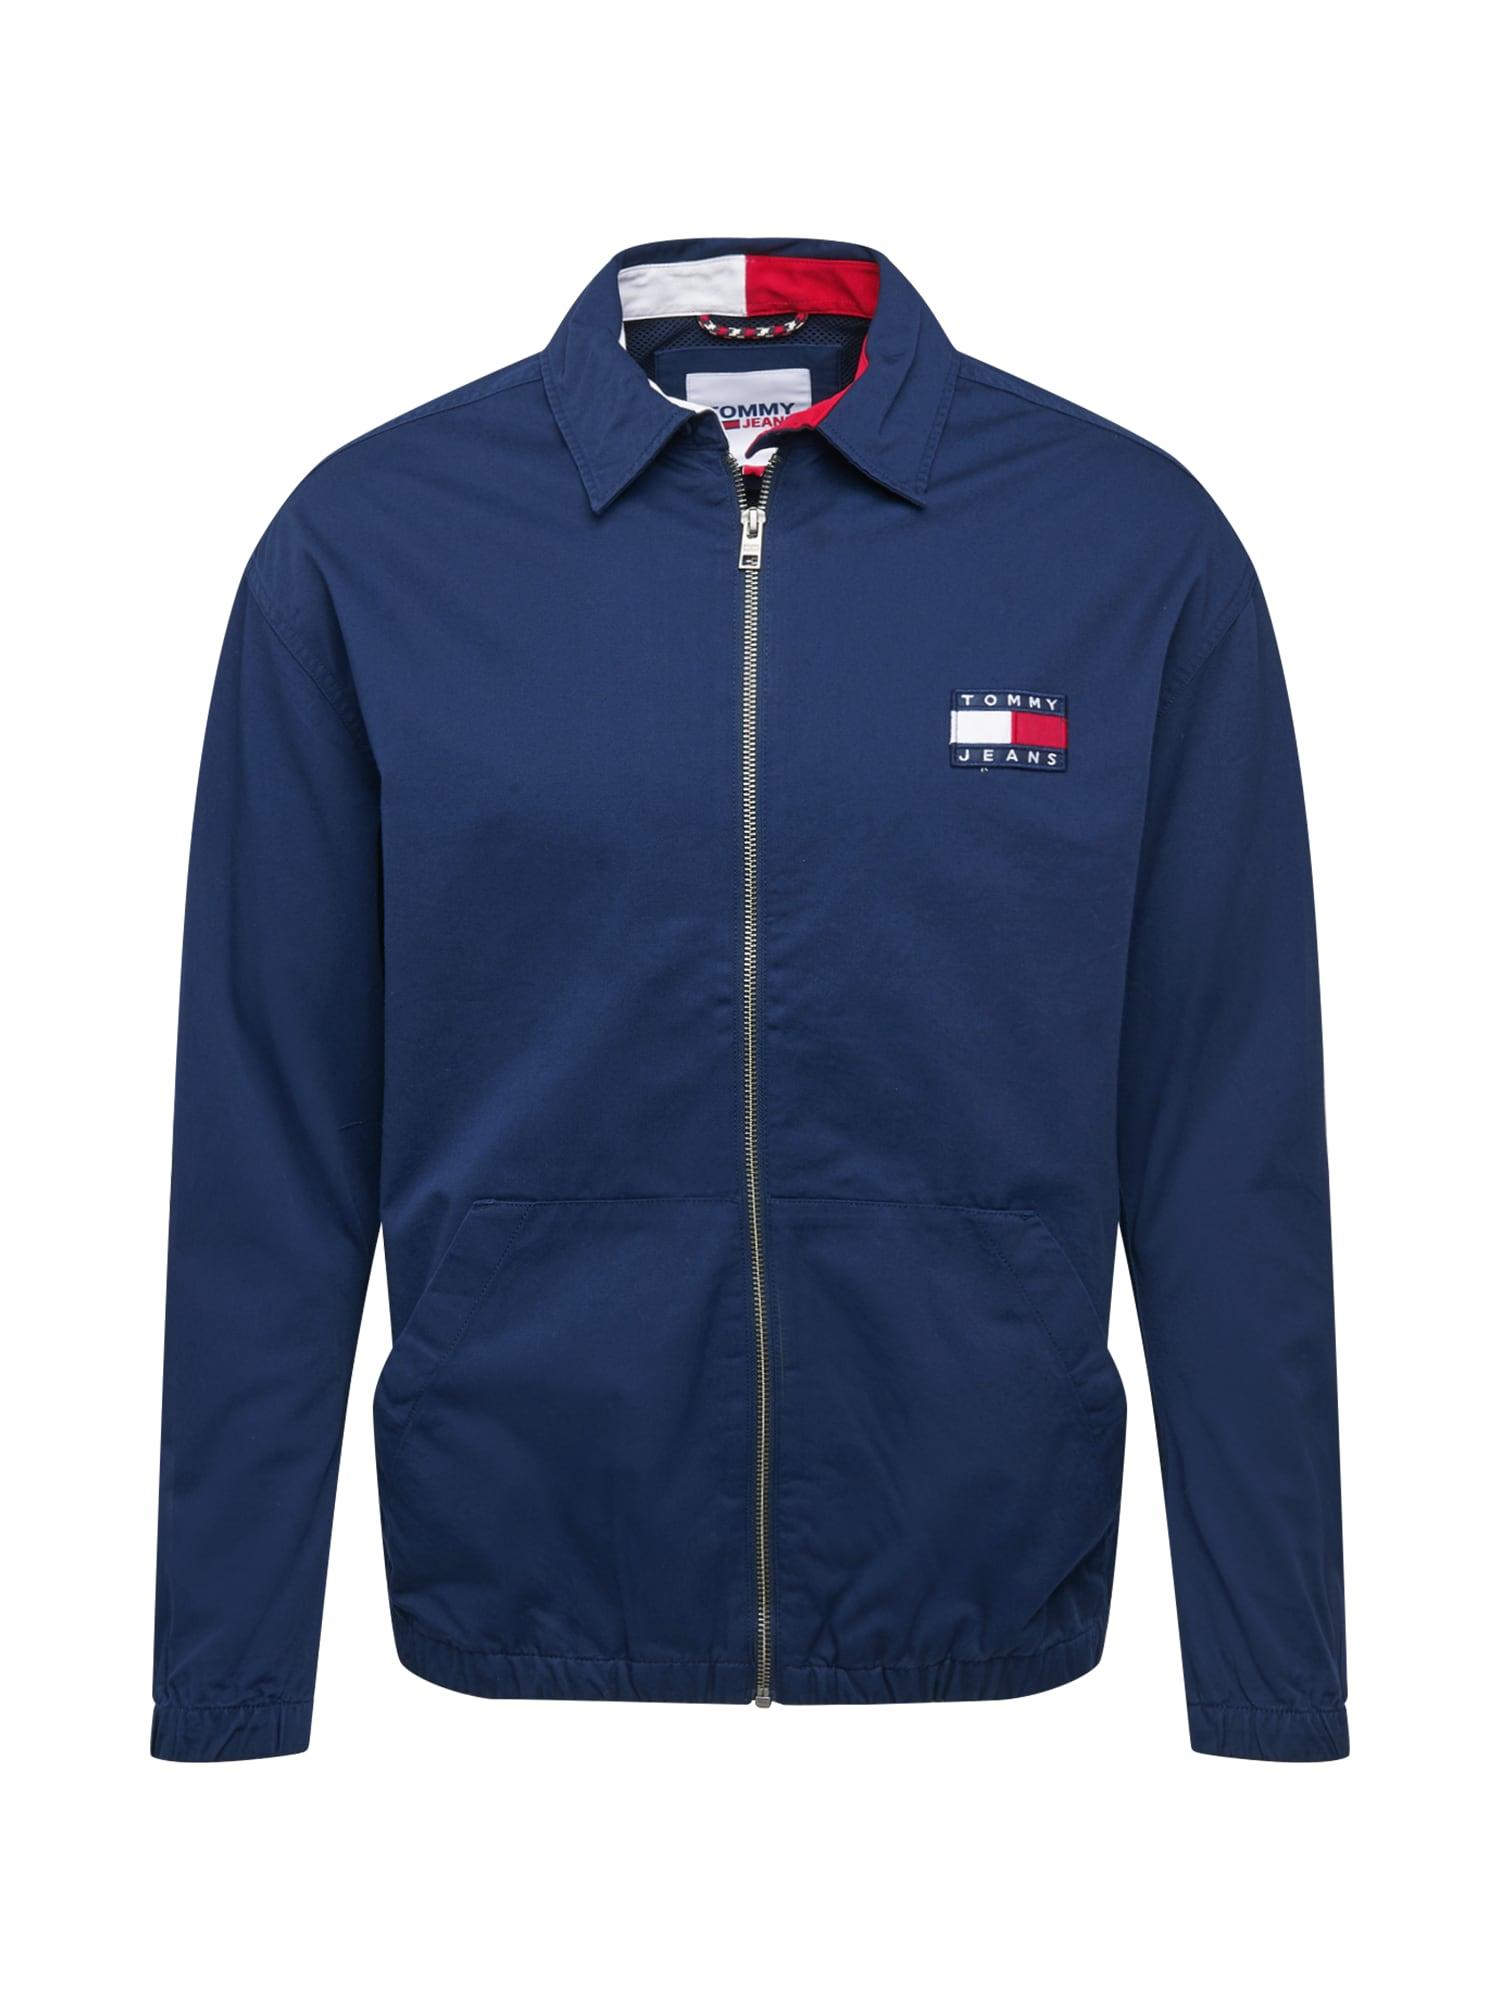 Tommy Jeans Demisezoninė striukė tamsiai mėlyna / balta / ugnies raudona